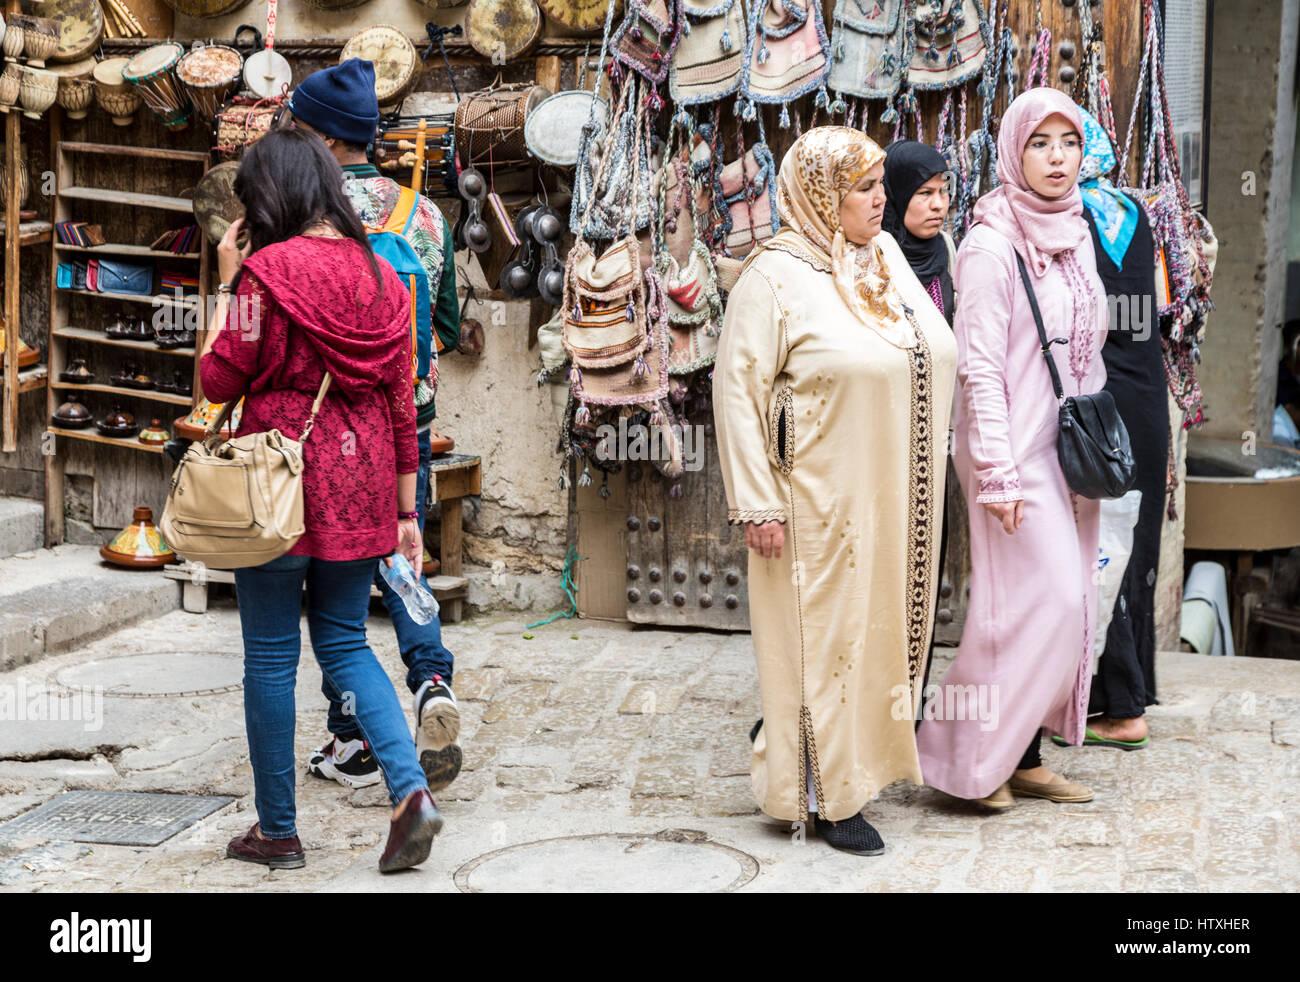 Morocco Dress Fashion